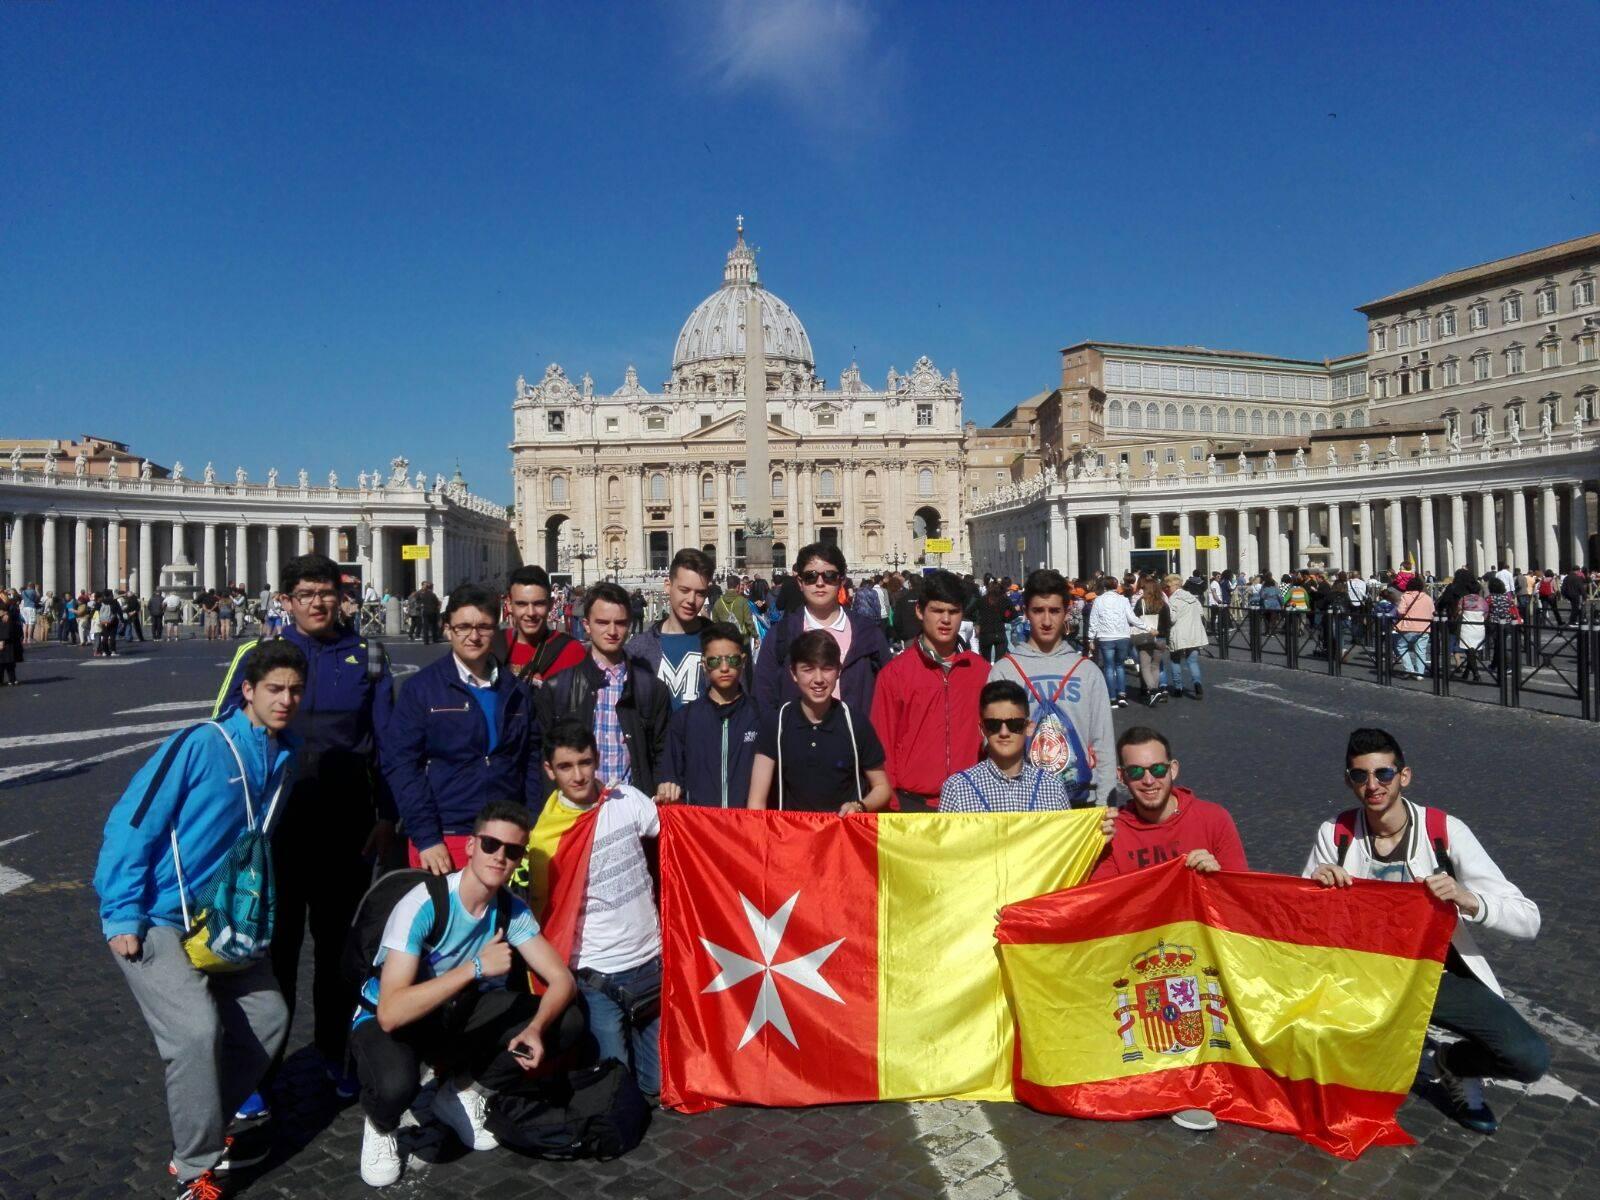 Viaje fin de curso colegio mercedario de herencia a Roma 2016_a